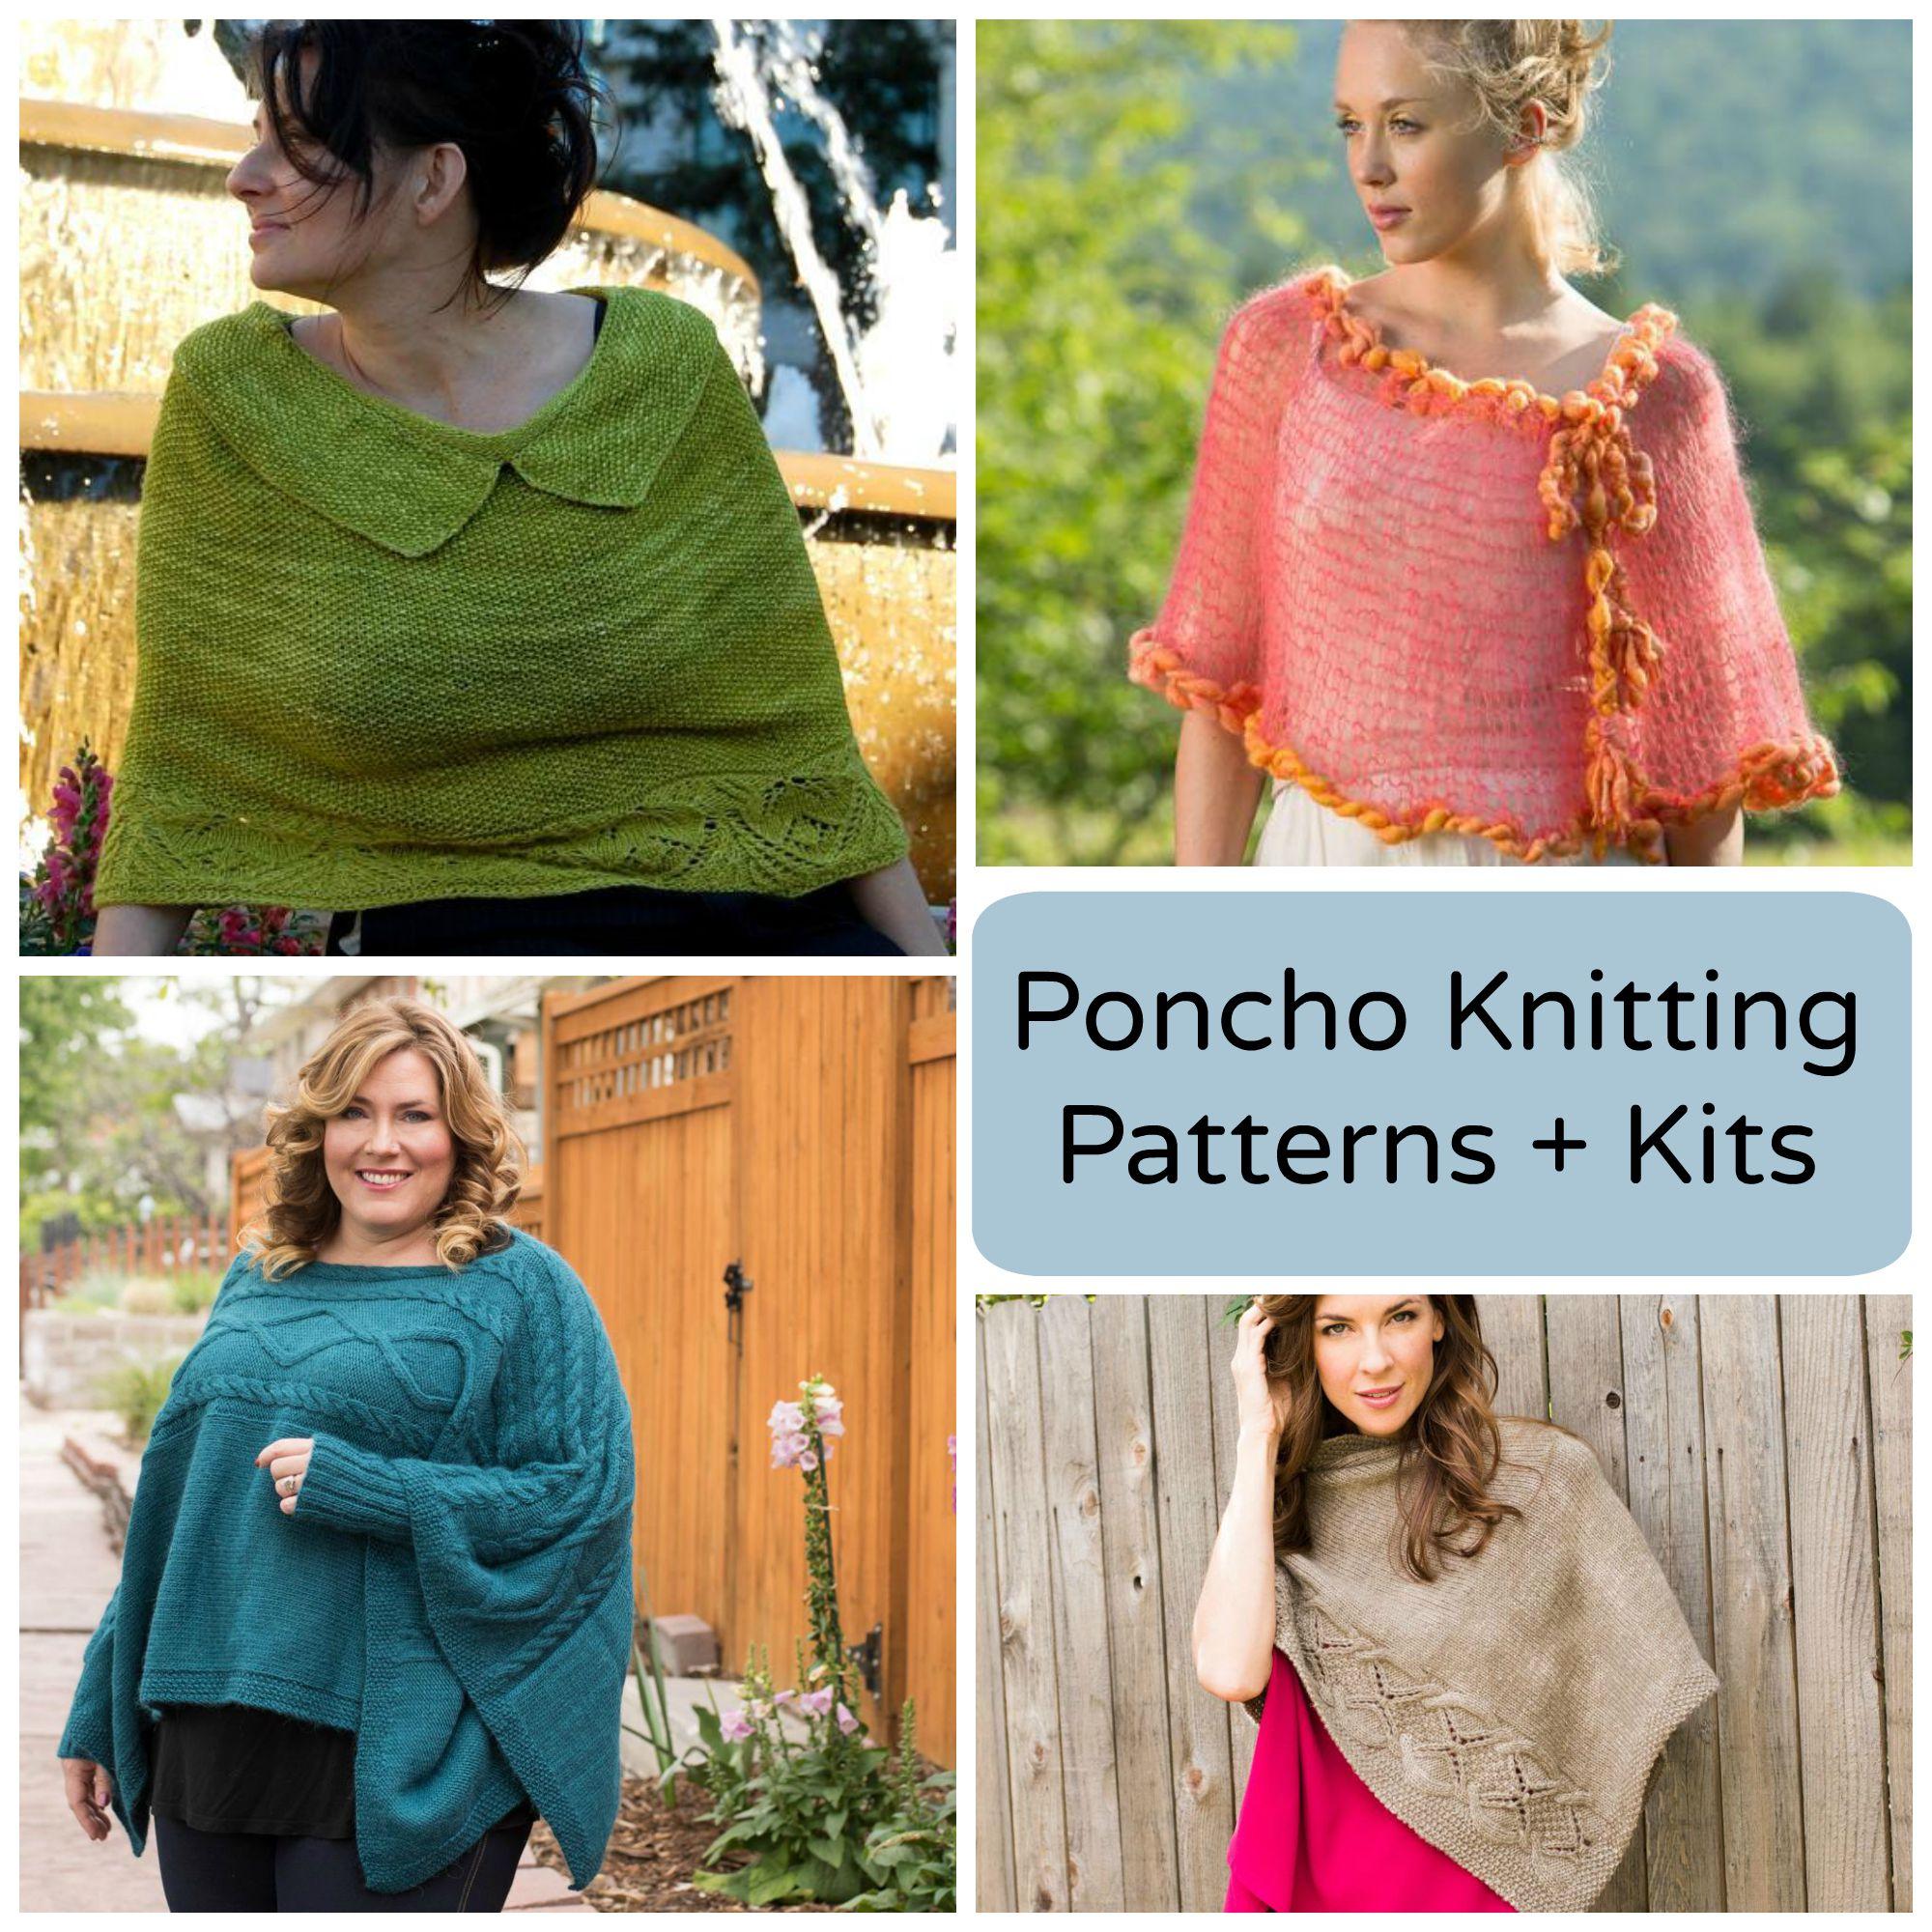 Free Easy Baby Poncho Knitting Pattern Modern Stylish Poncho Knitting Patterns Kits